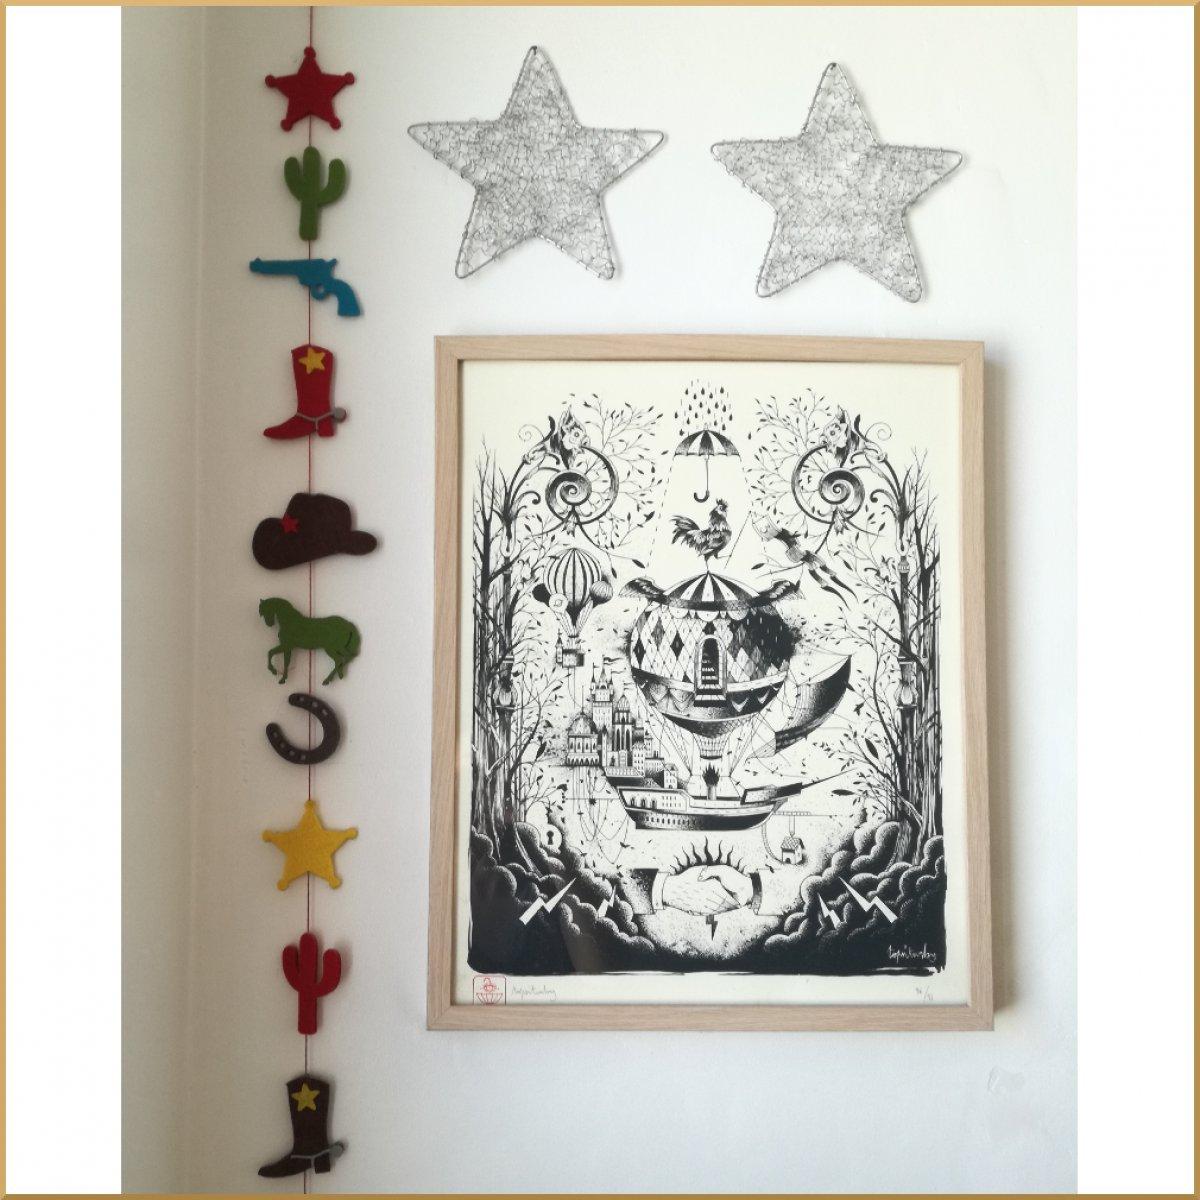 Sérigraphie de Topsiturby, illustrateur et tatoueur lyonnais dont Stefayako possède plusieurs tattoos.